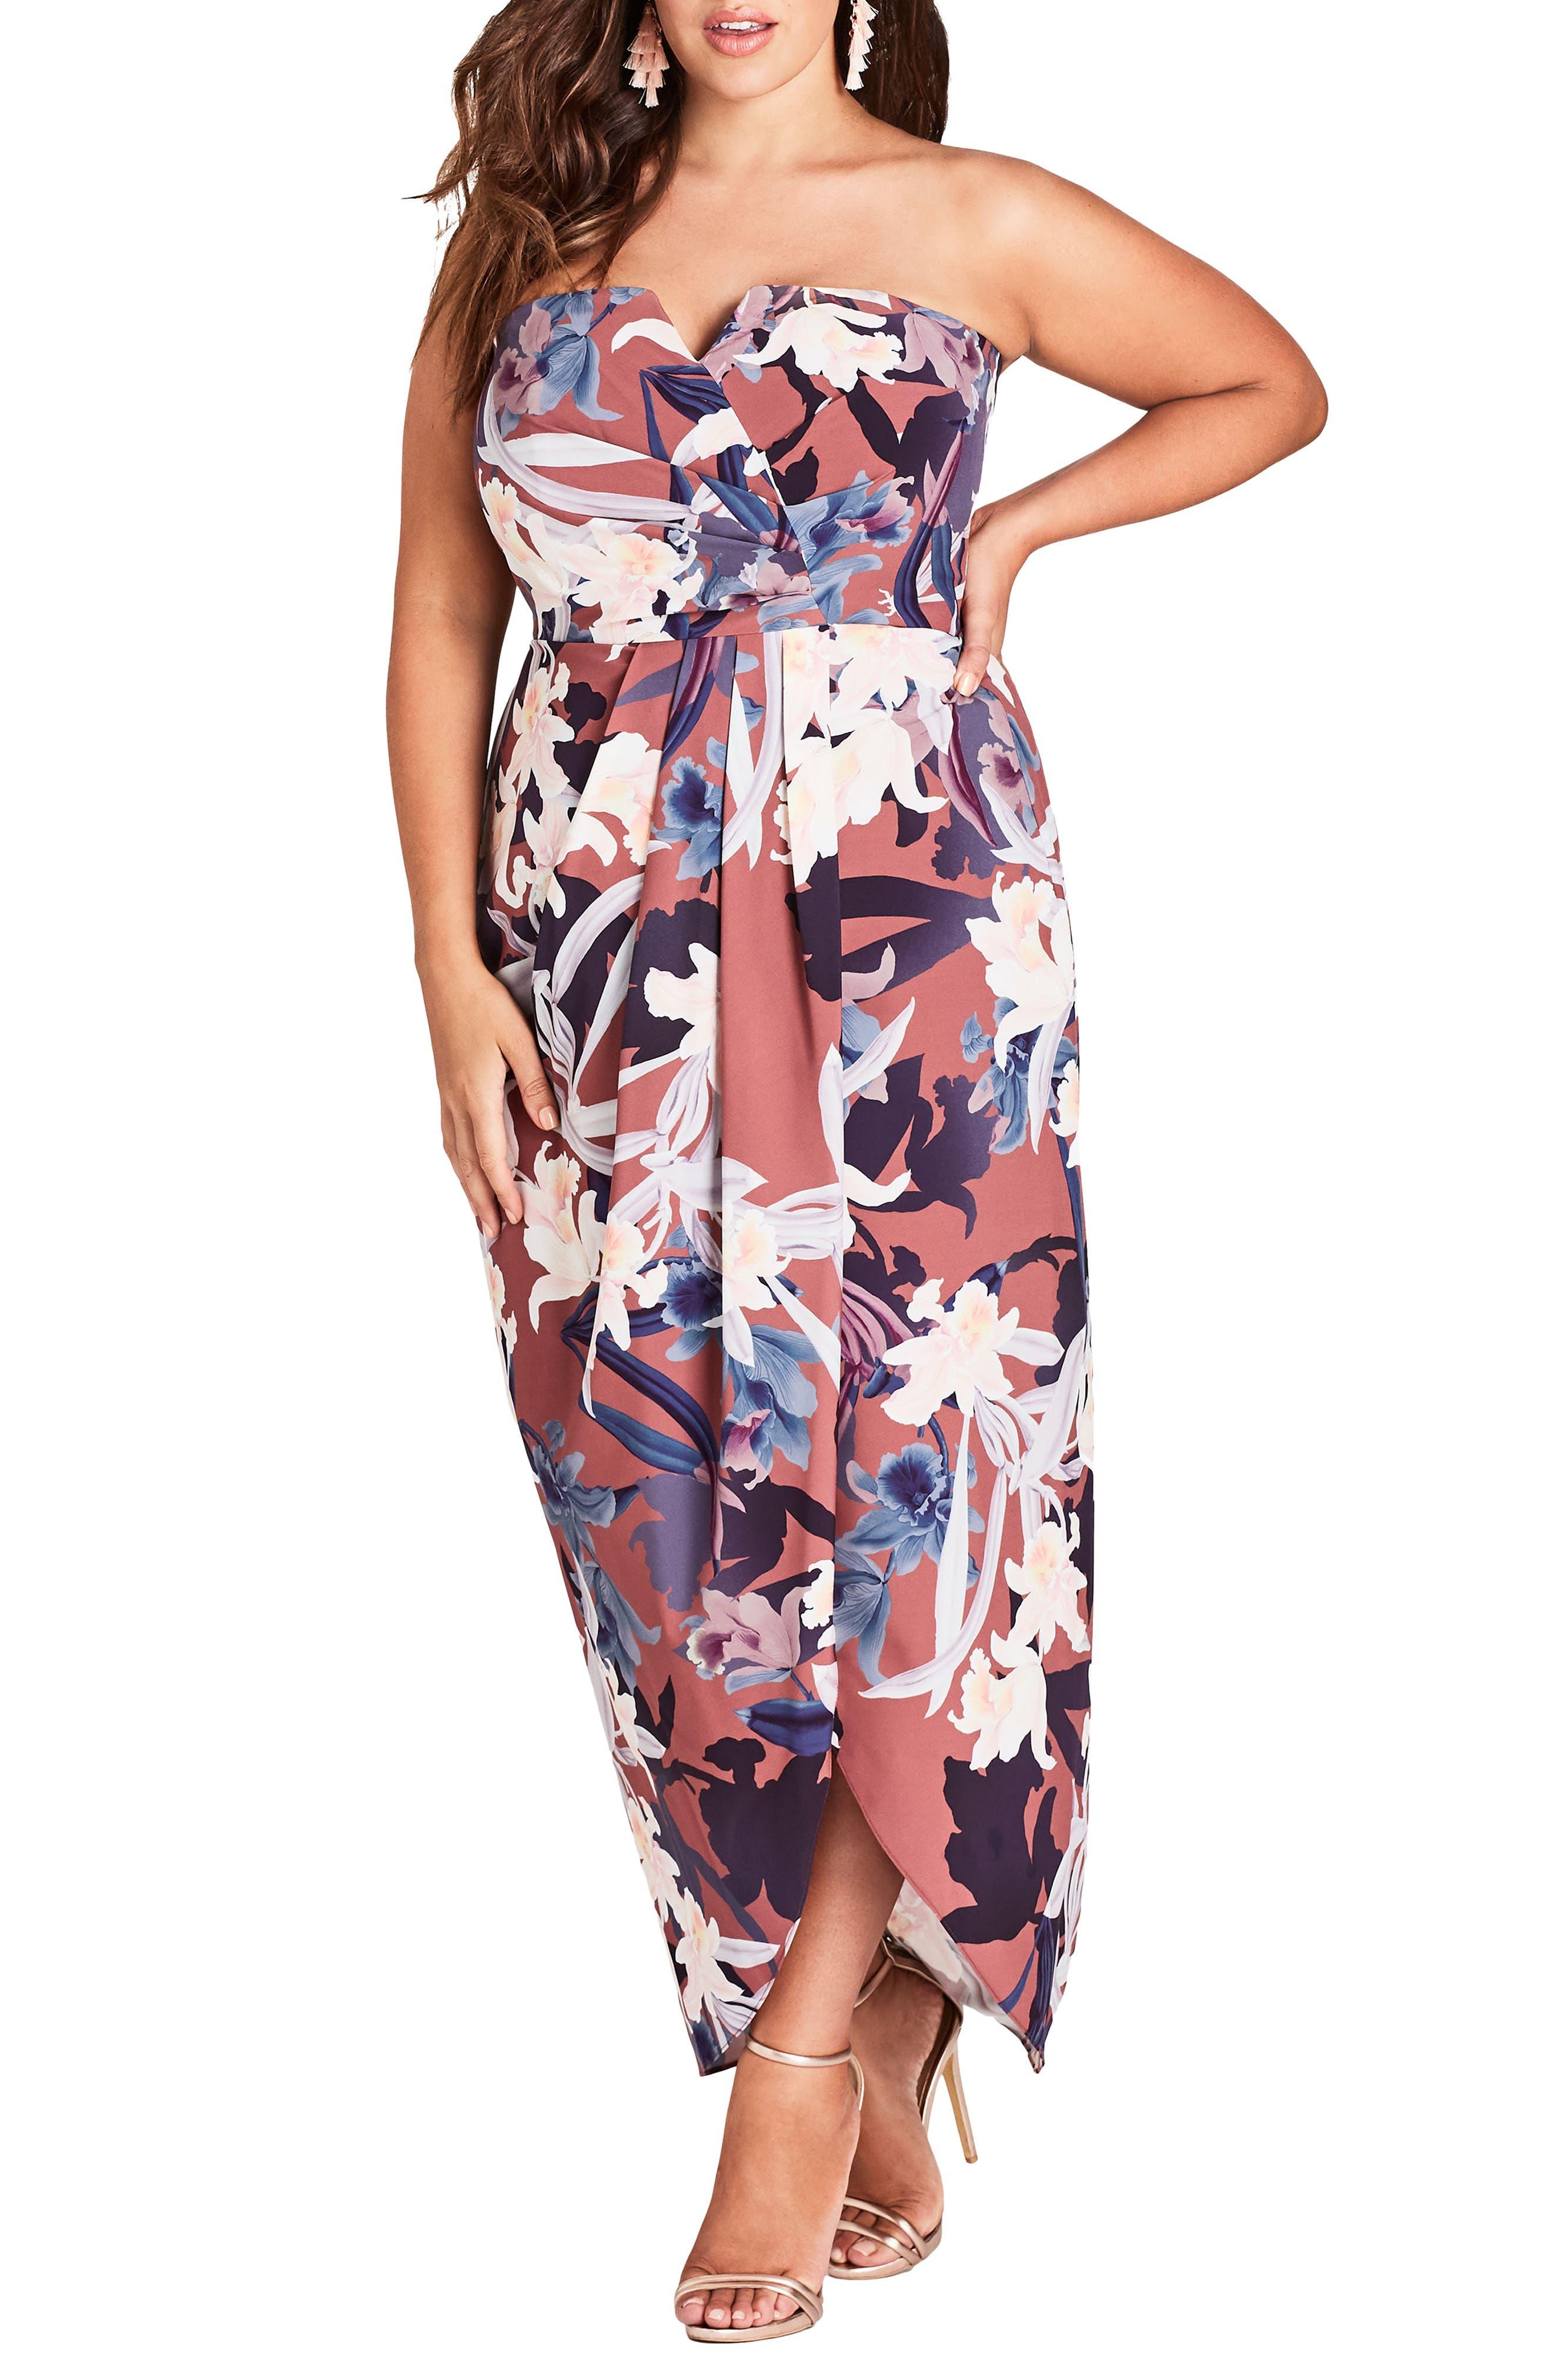 CITY CHIC,                             Lavish Floral Strapless Dress,                             Main thumbnail 1, color,                             200